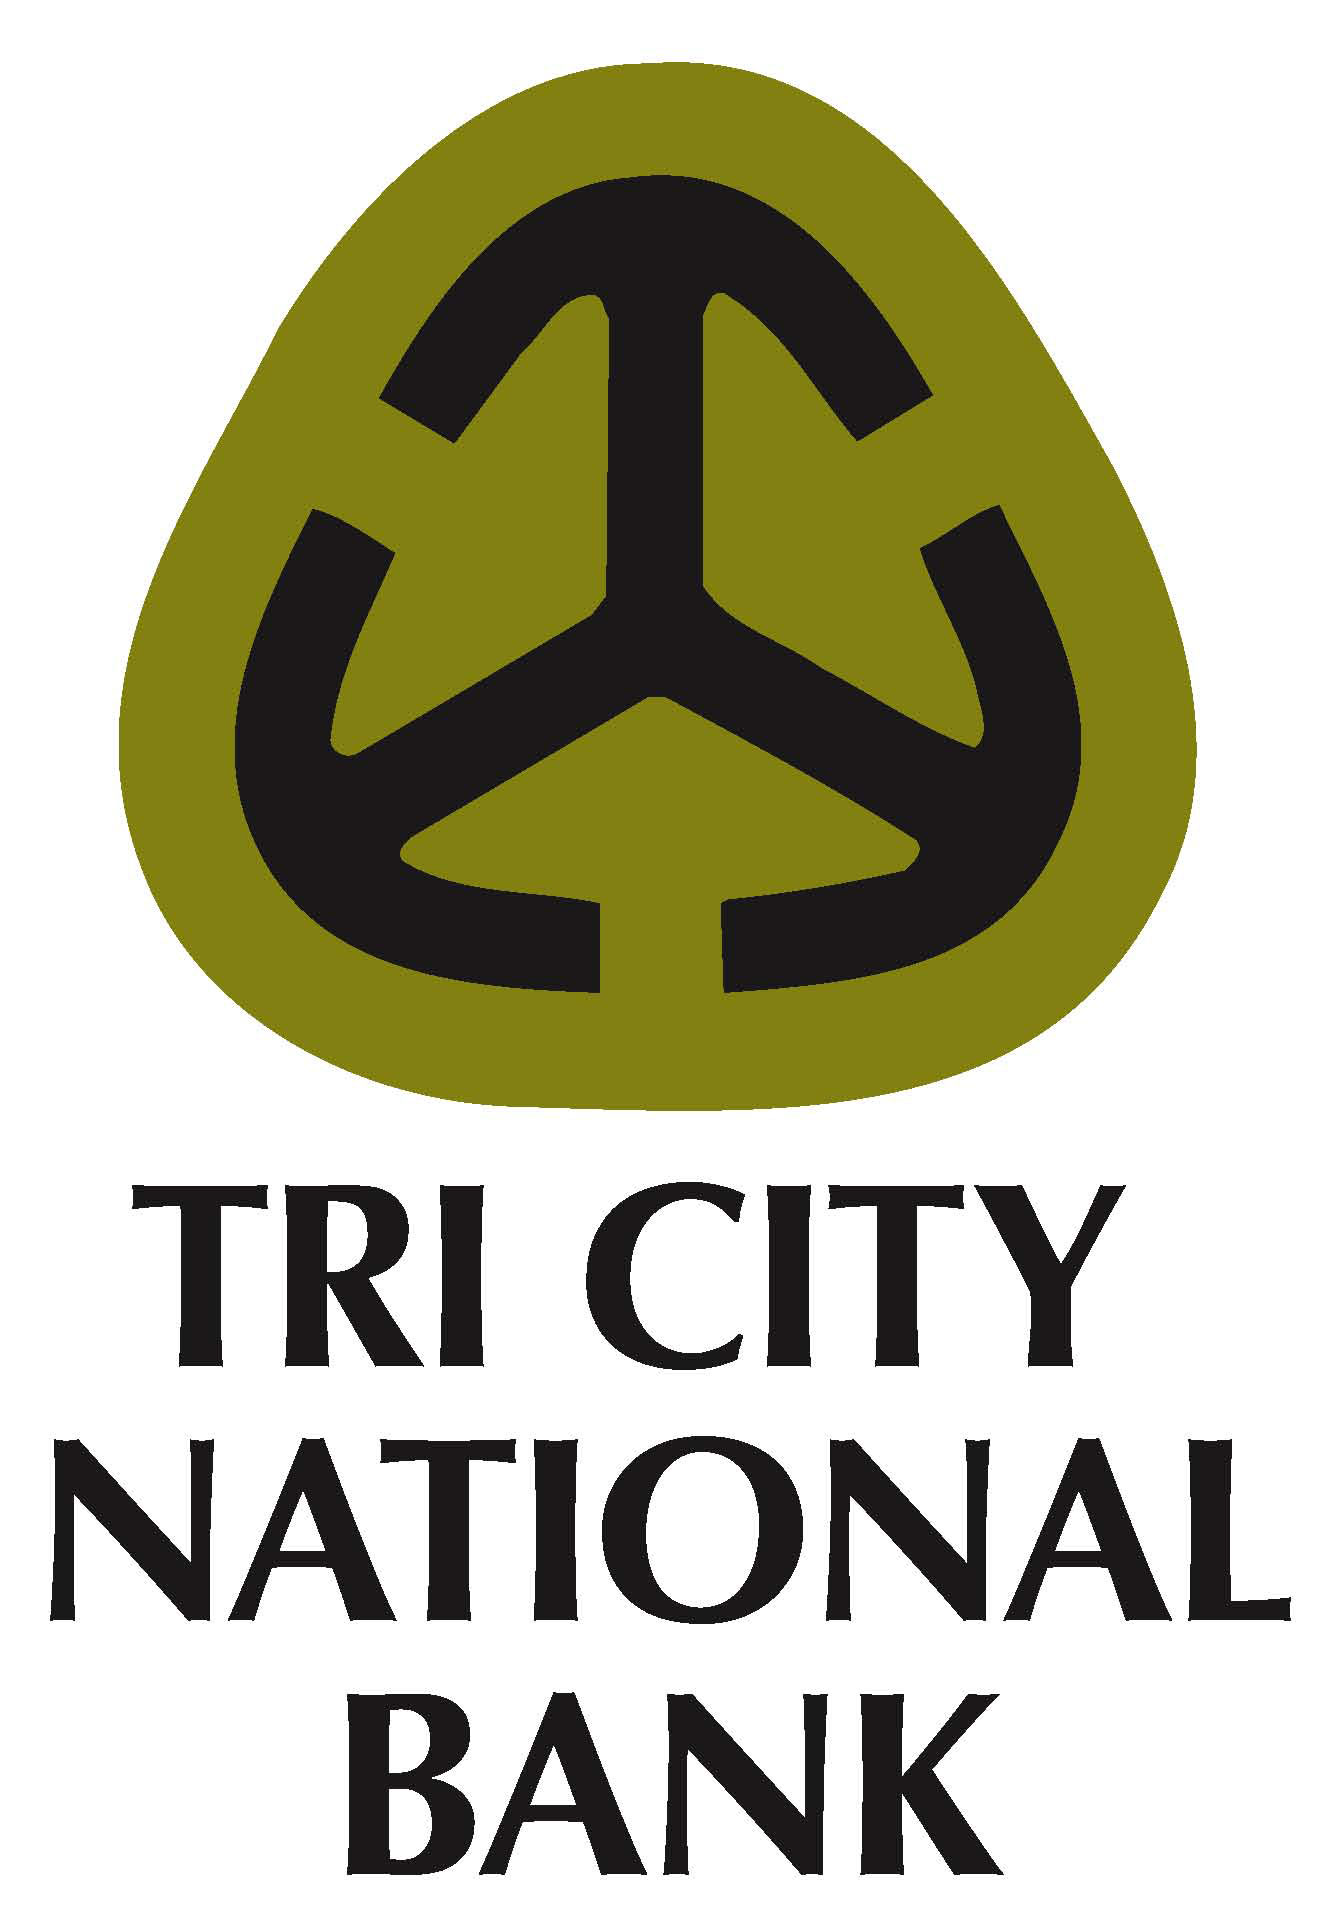 TCNB_logo